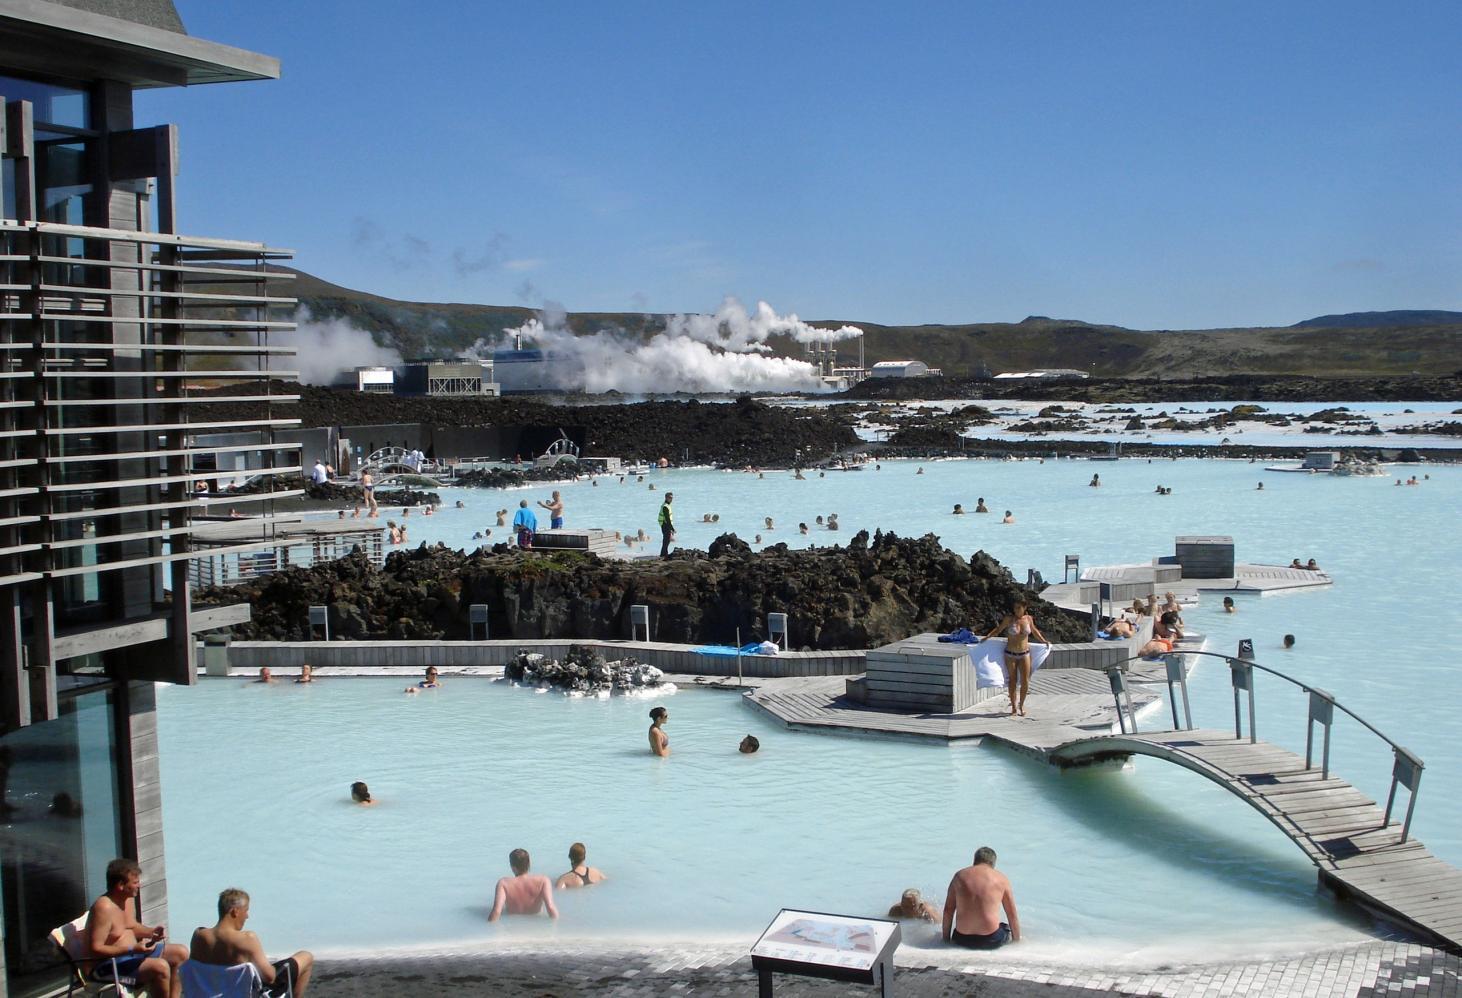 Бар «Лагуна» (Lagoon Bar), Исландия